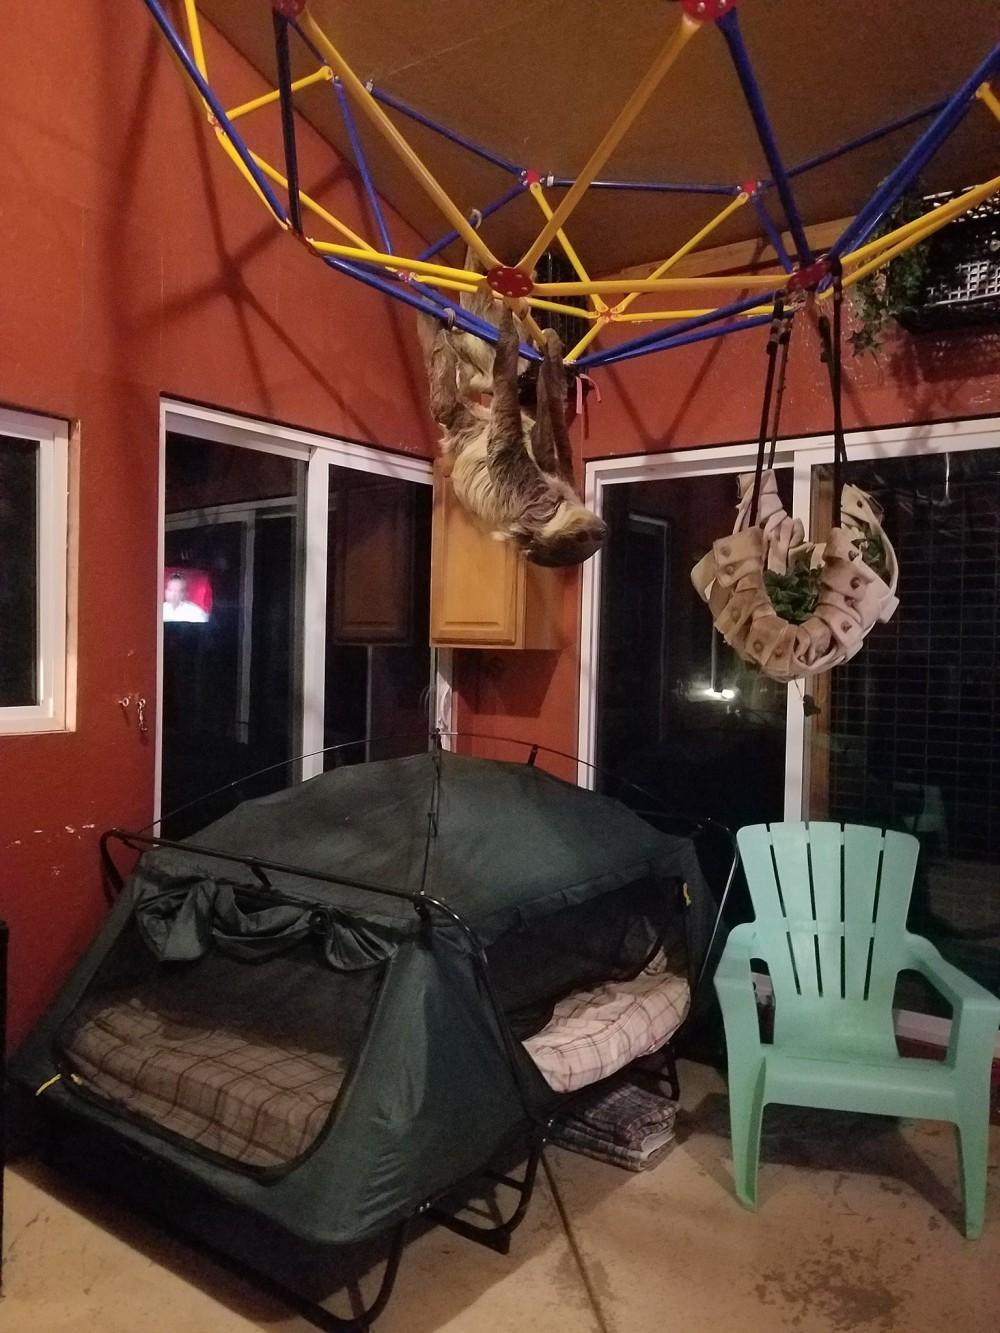 ZWCC Sloth Center